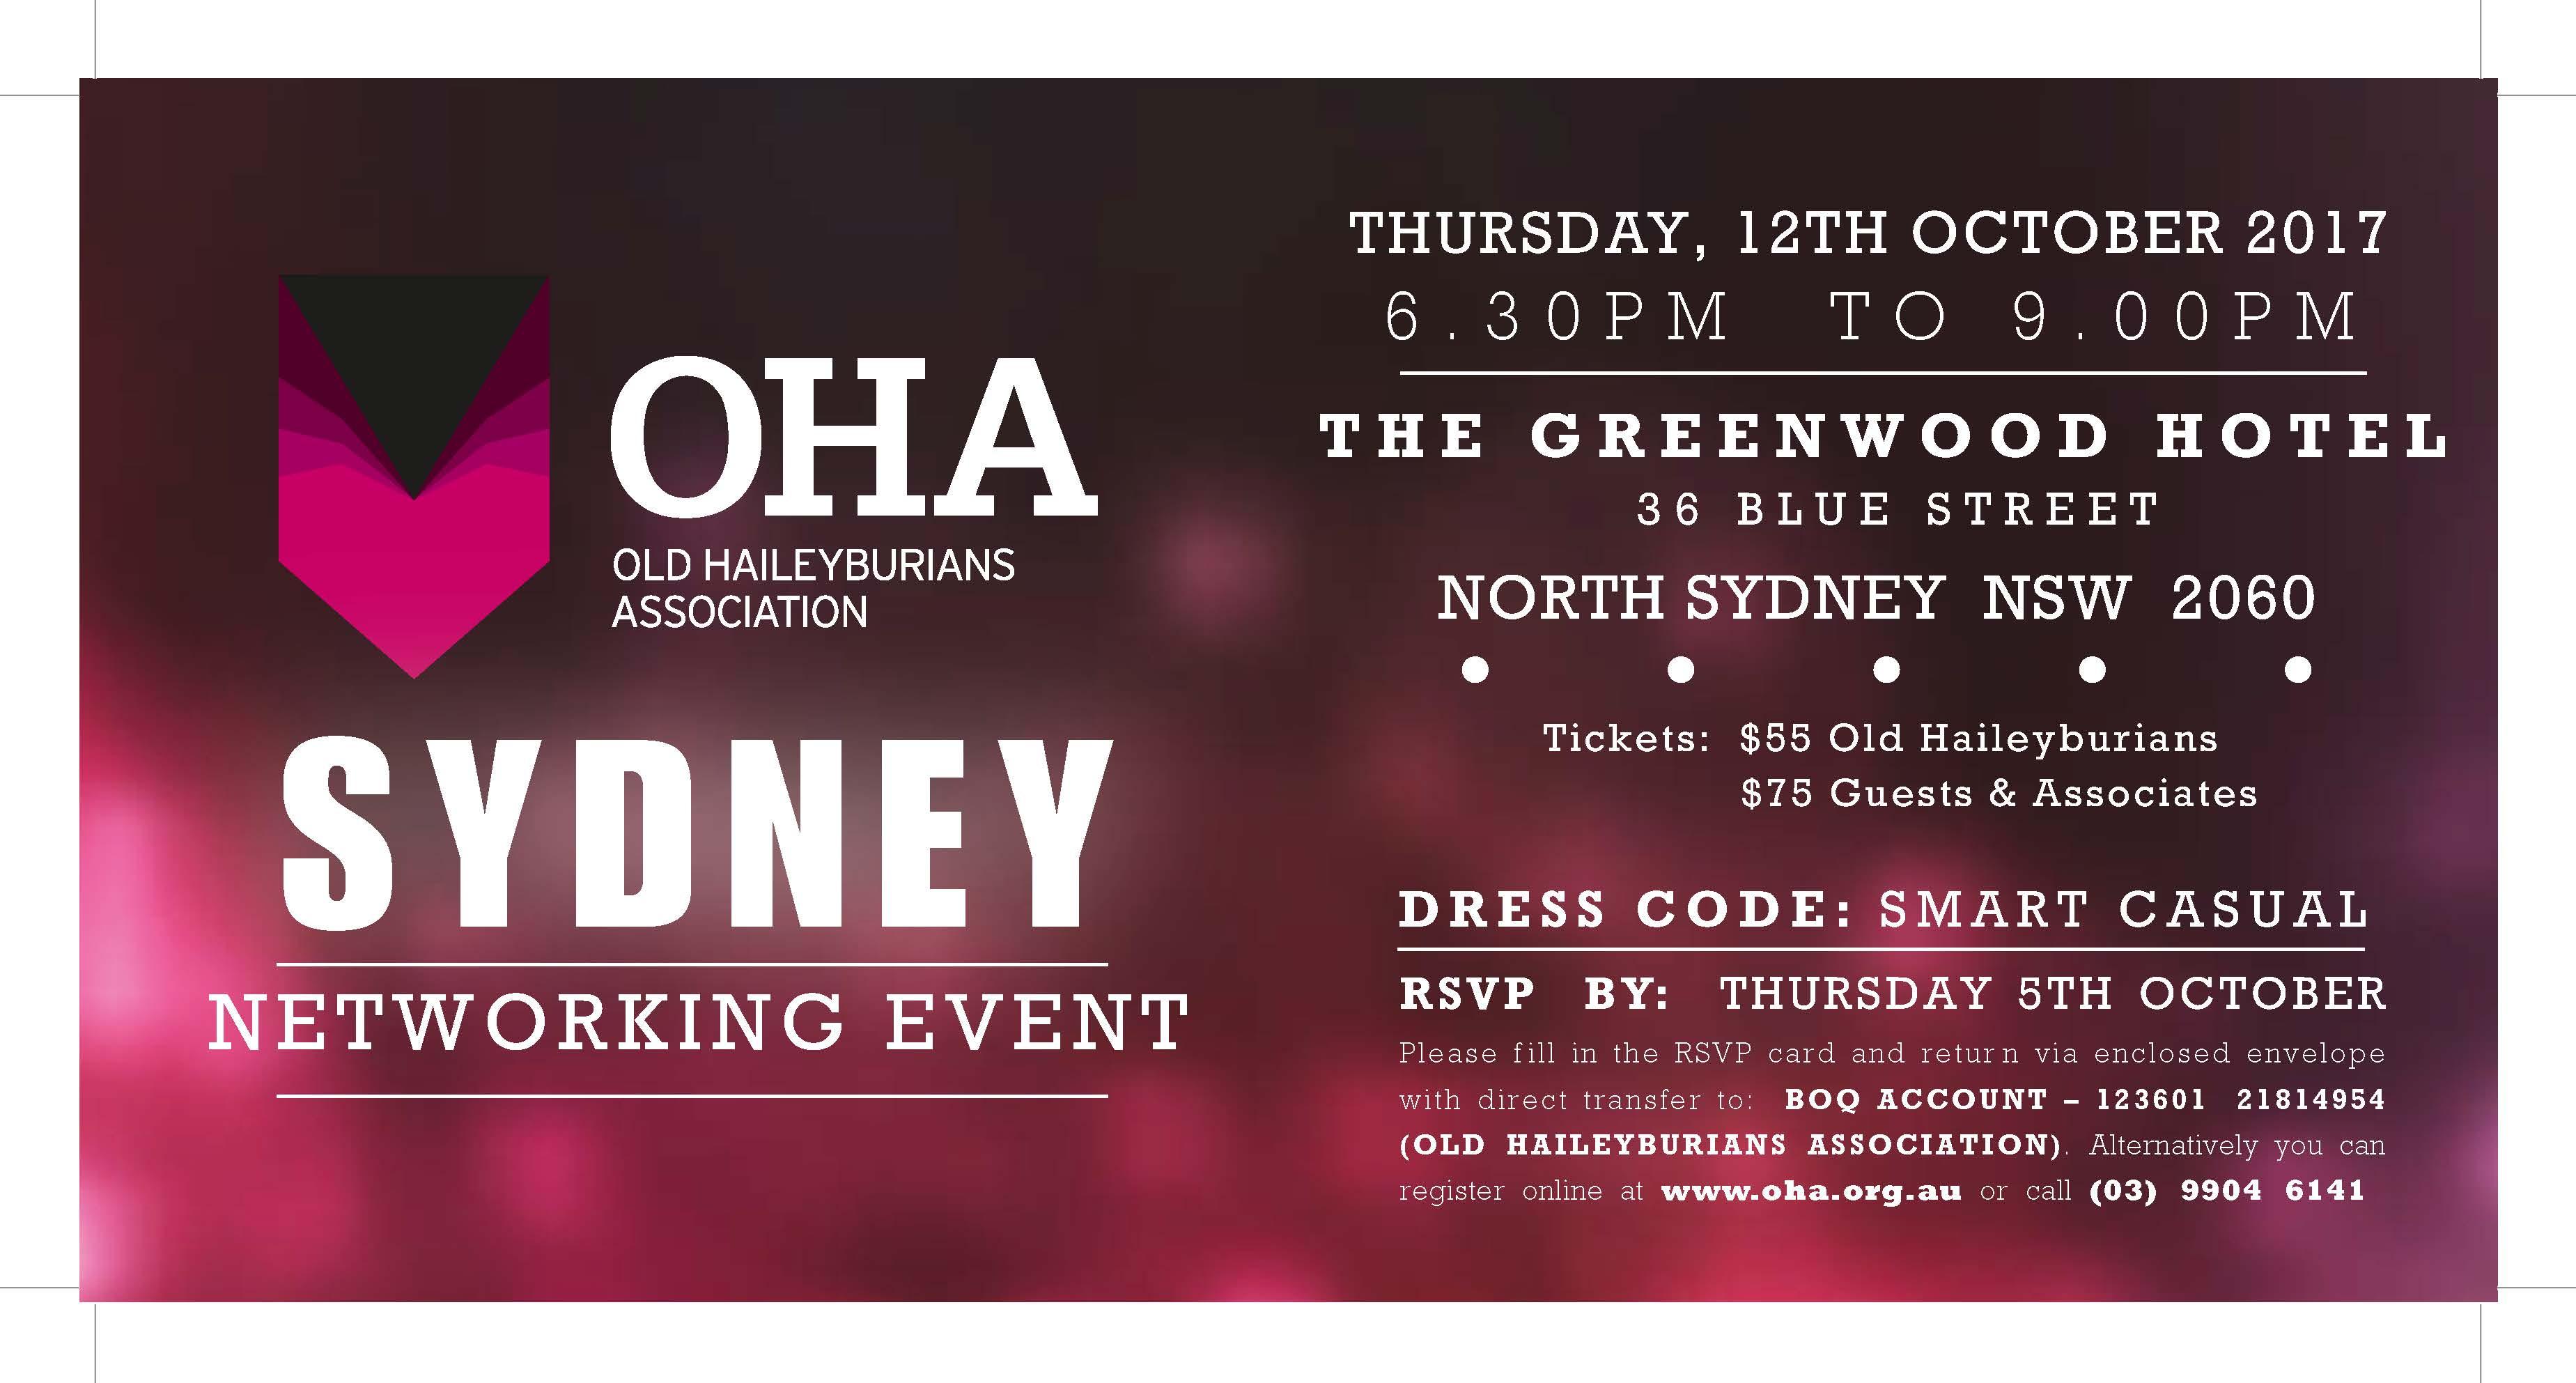 OHA Sydney Networking Event